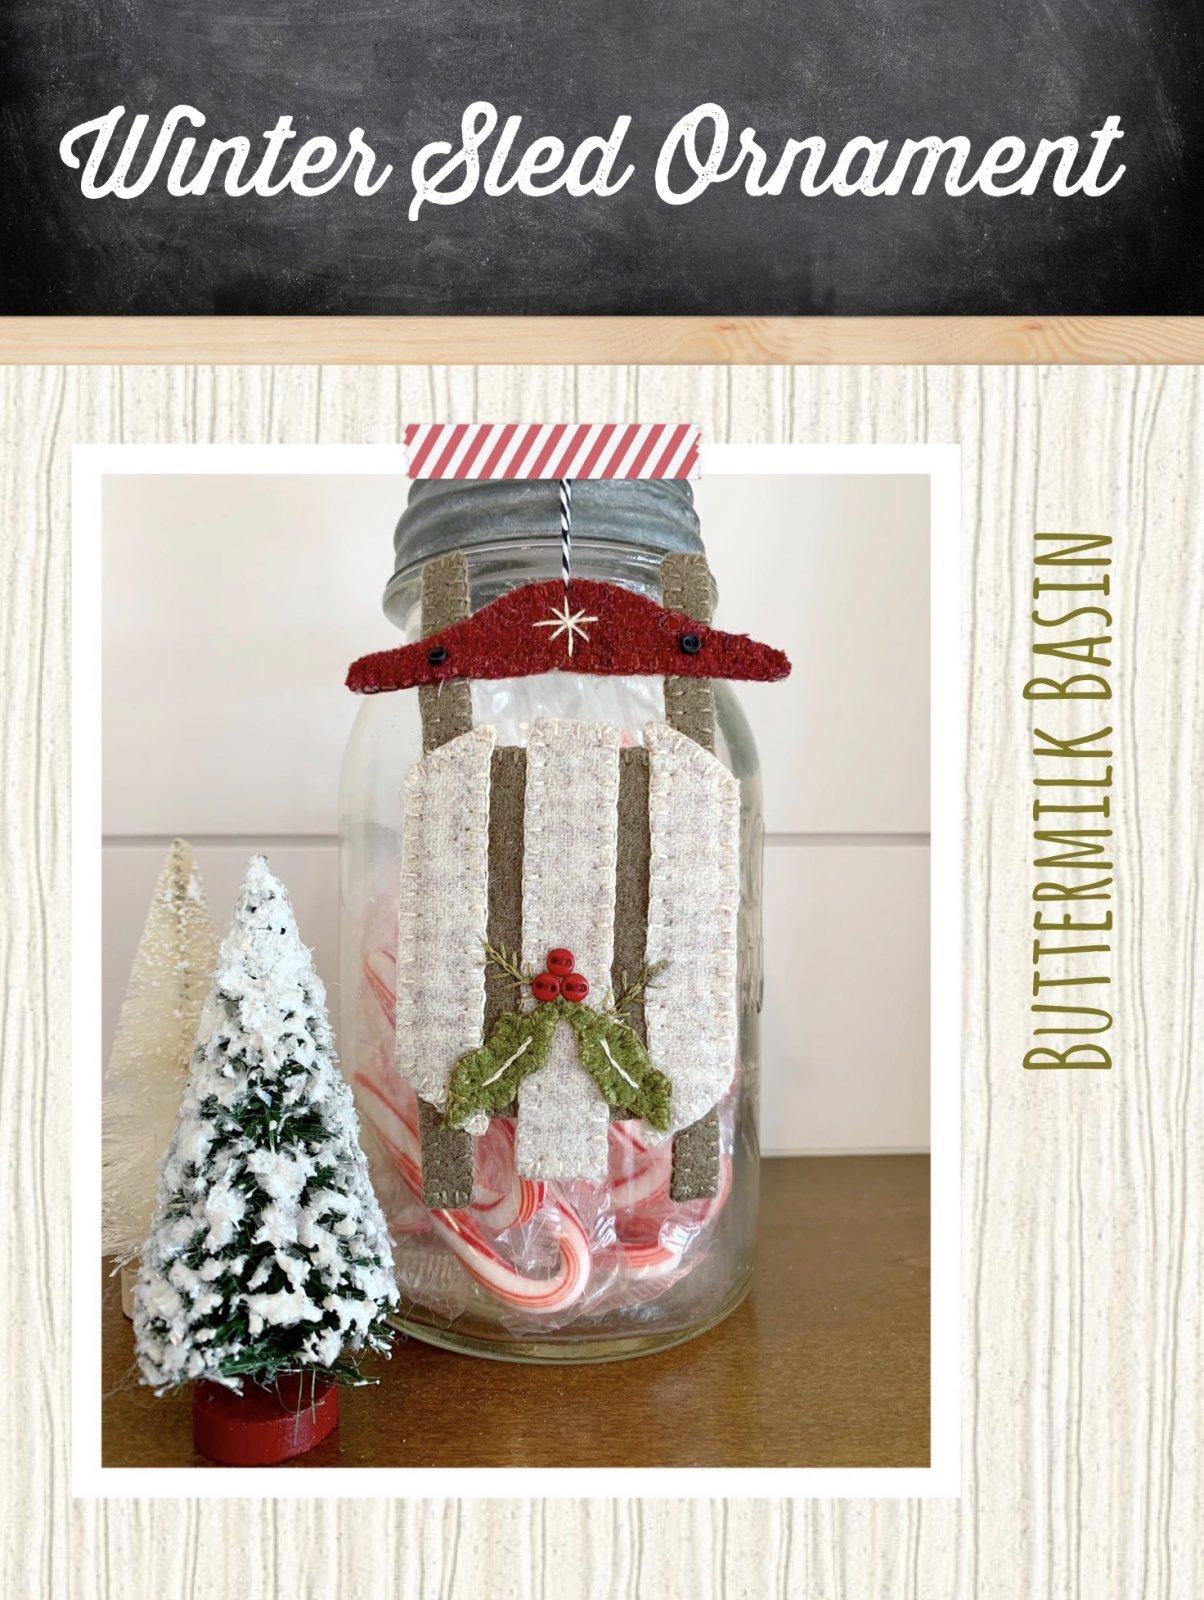 Winter Sled Ornament * Pattern & Kit